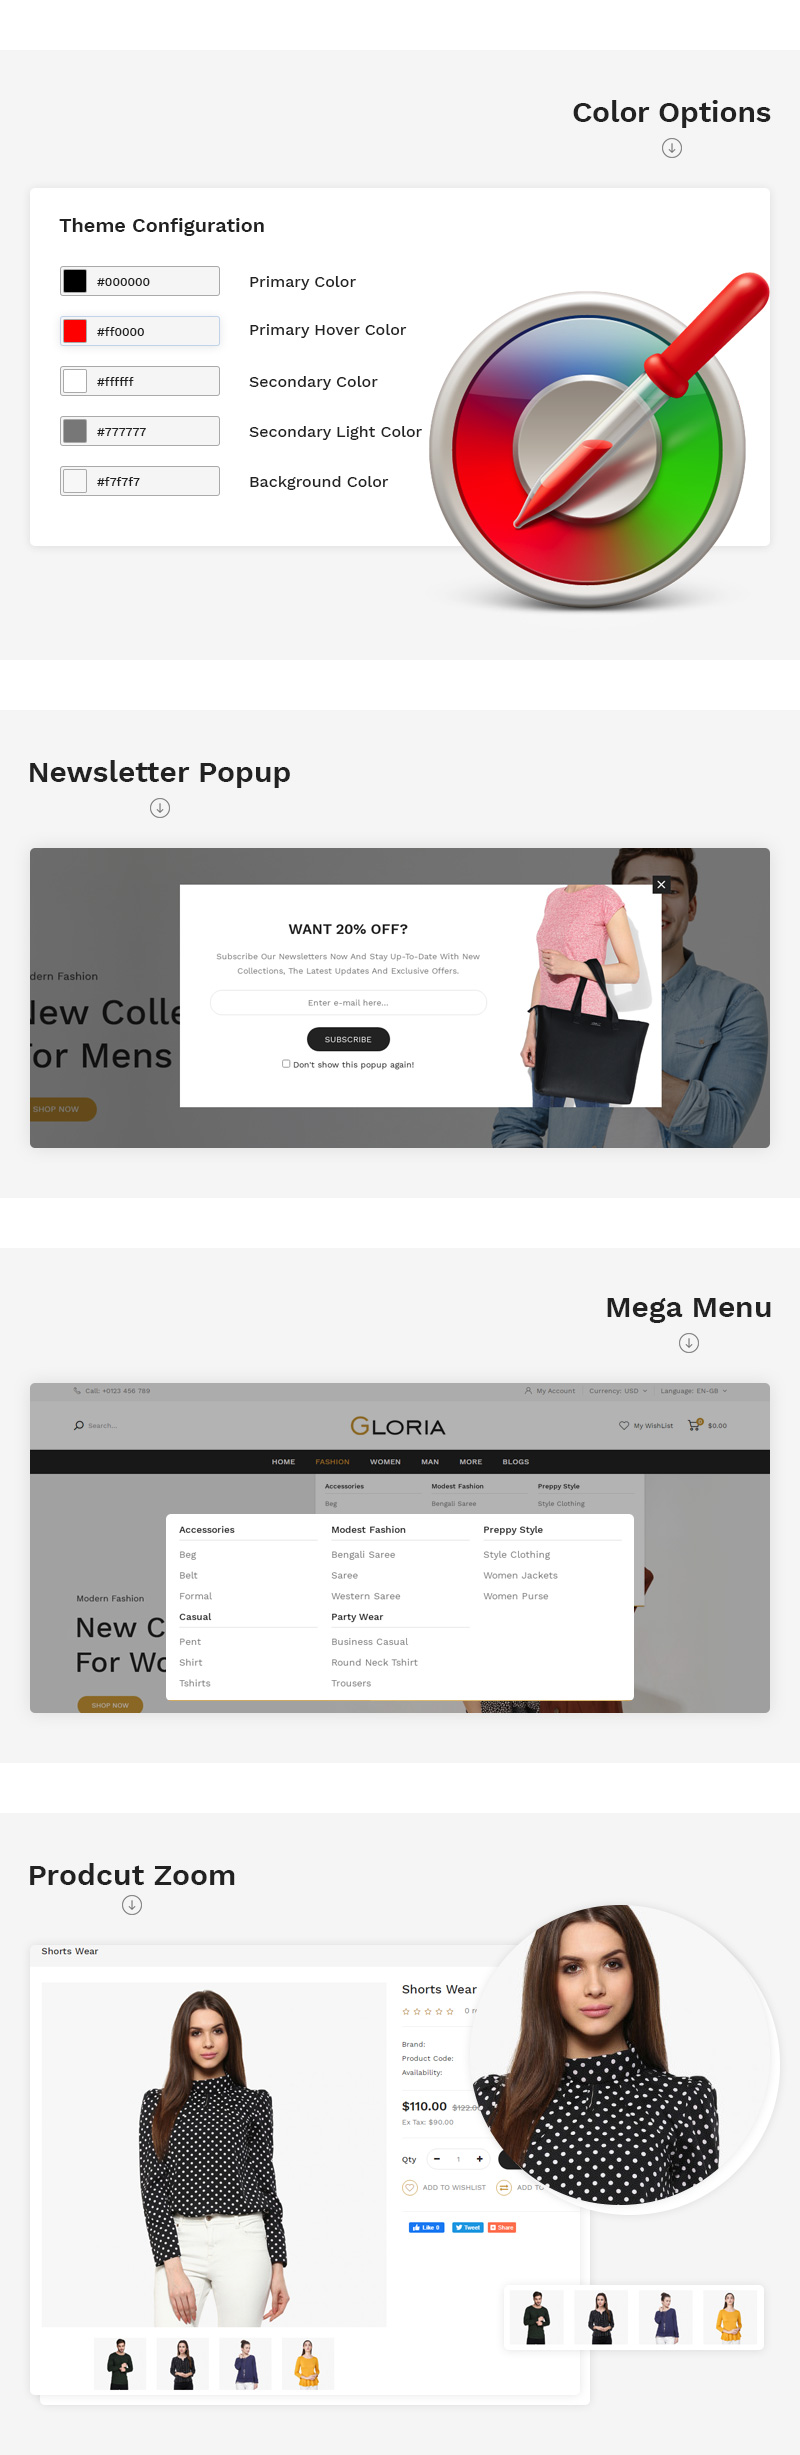 gloria-features-3.jpg